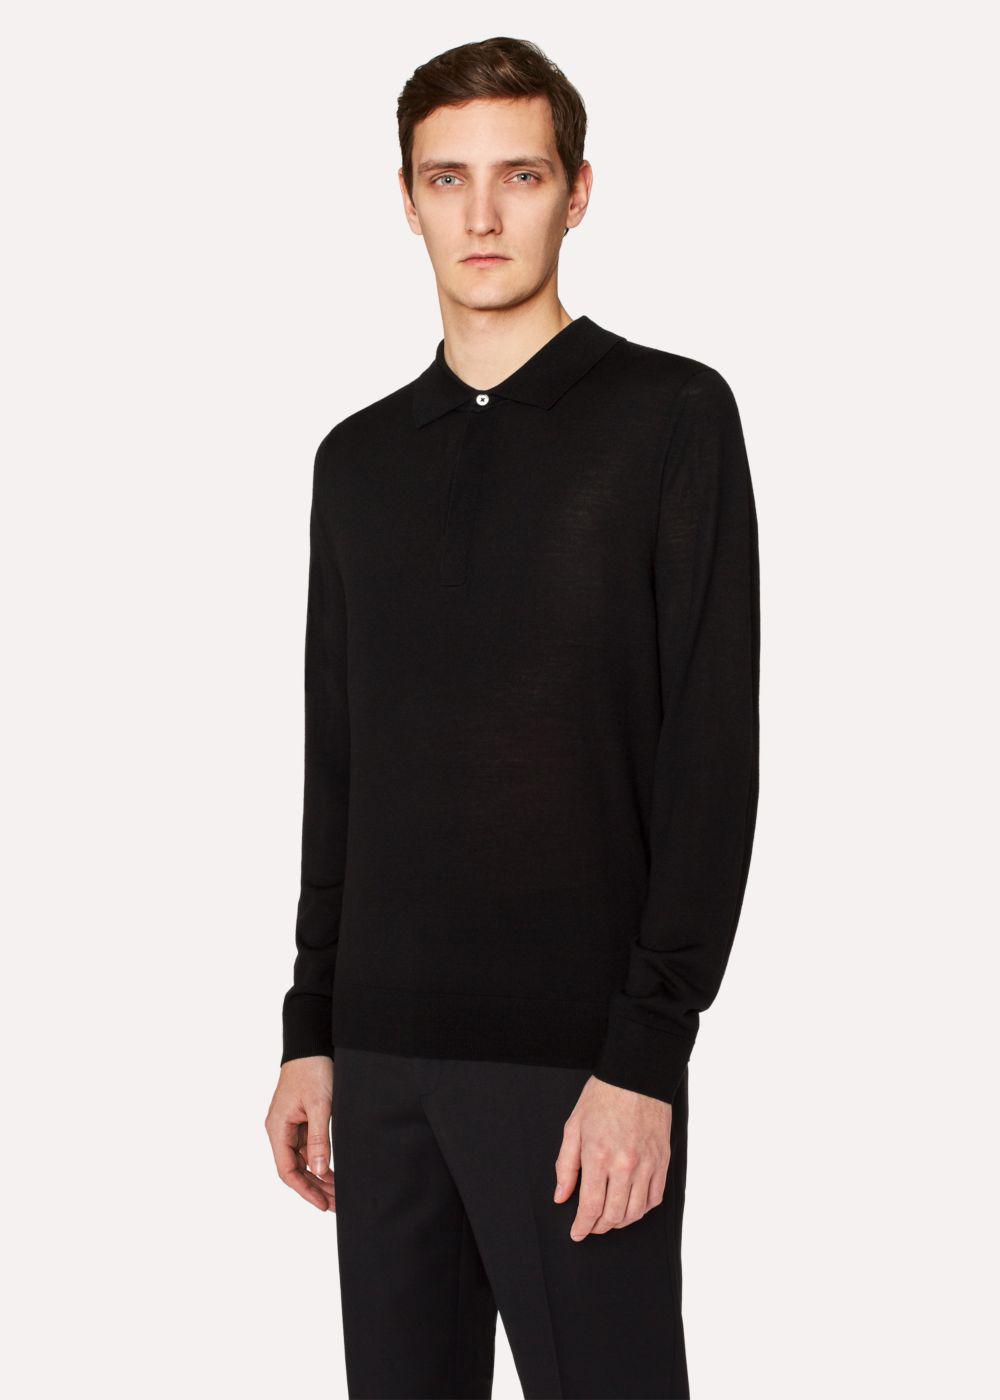 Paul smith men 39 s black merino wool long sleeve polo shirt for Merino wool shirt long sleeve